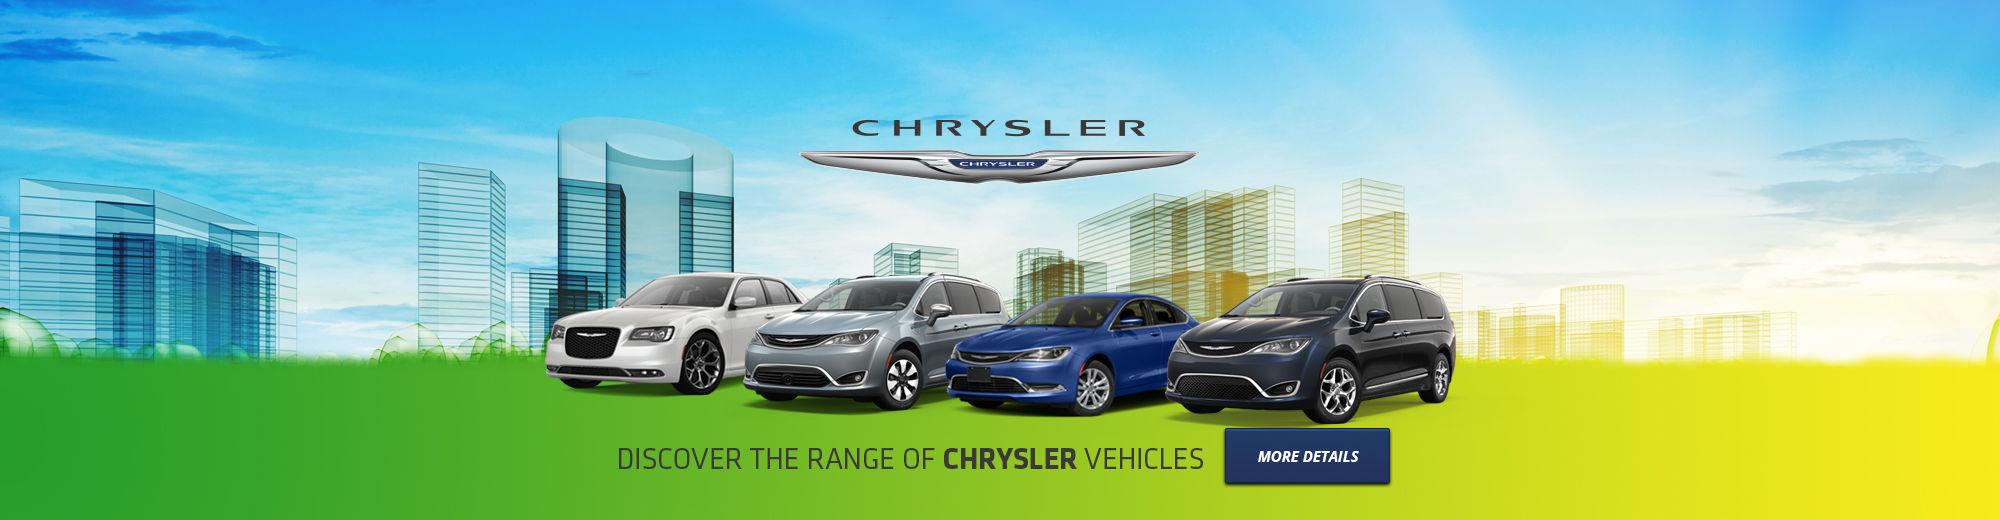 Discover the range of Chrysler vehicles